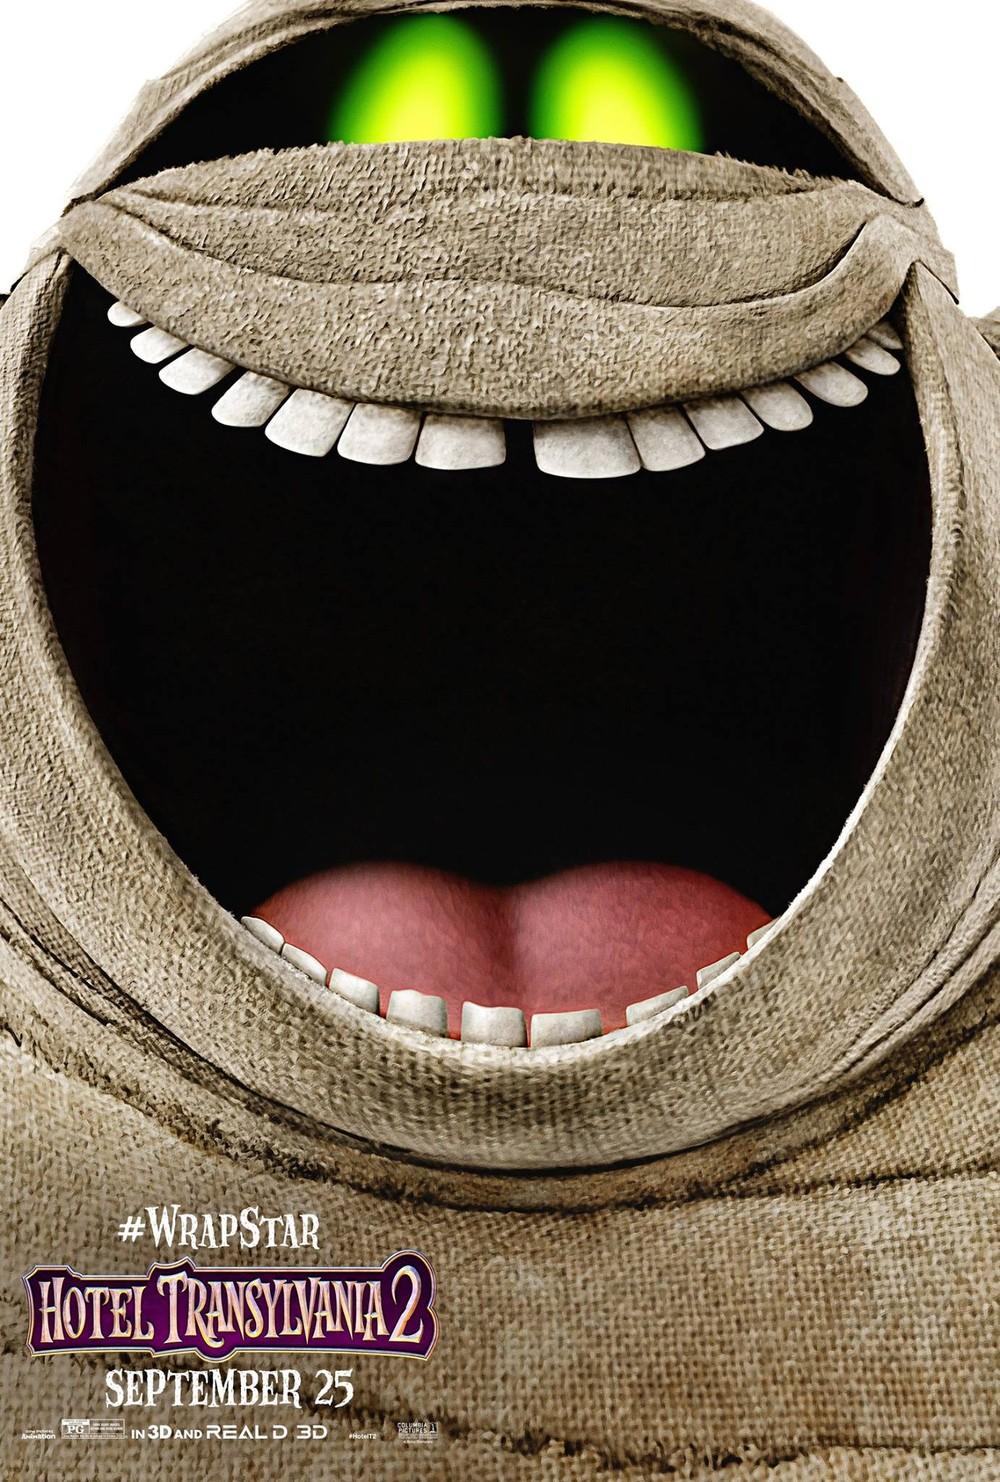 Hotel Transylvania 2 DVD Release Date | Redbox, Netflix ...